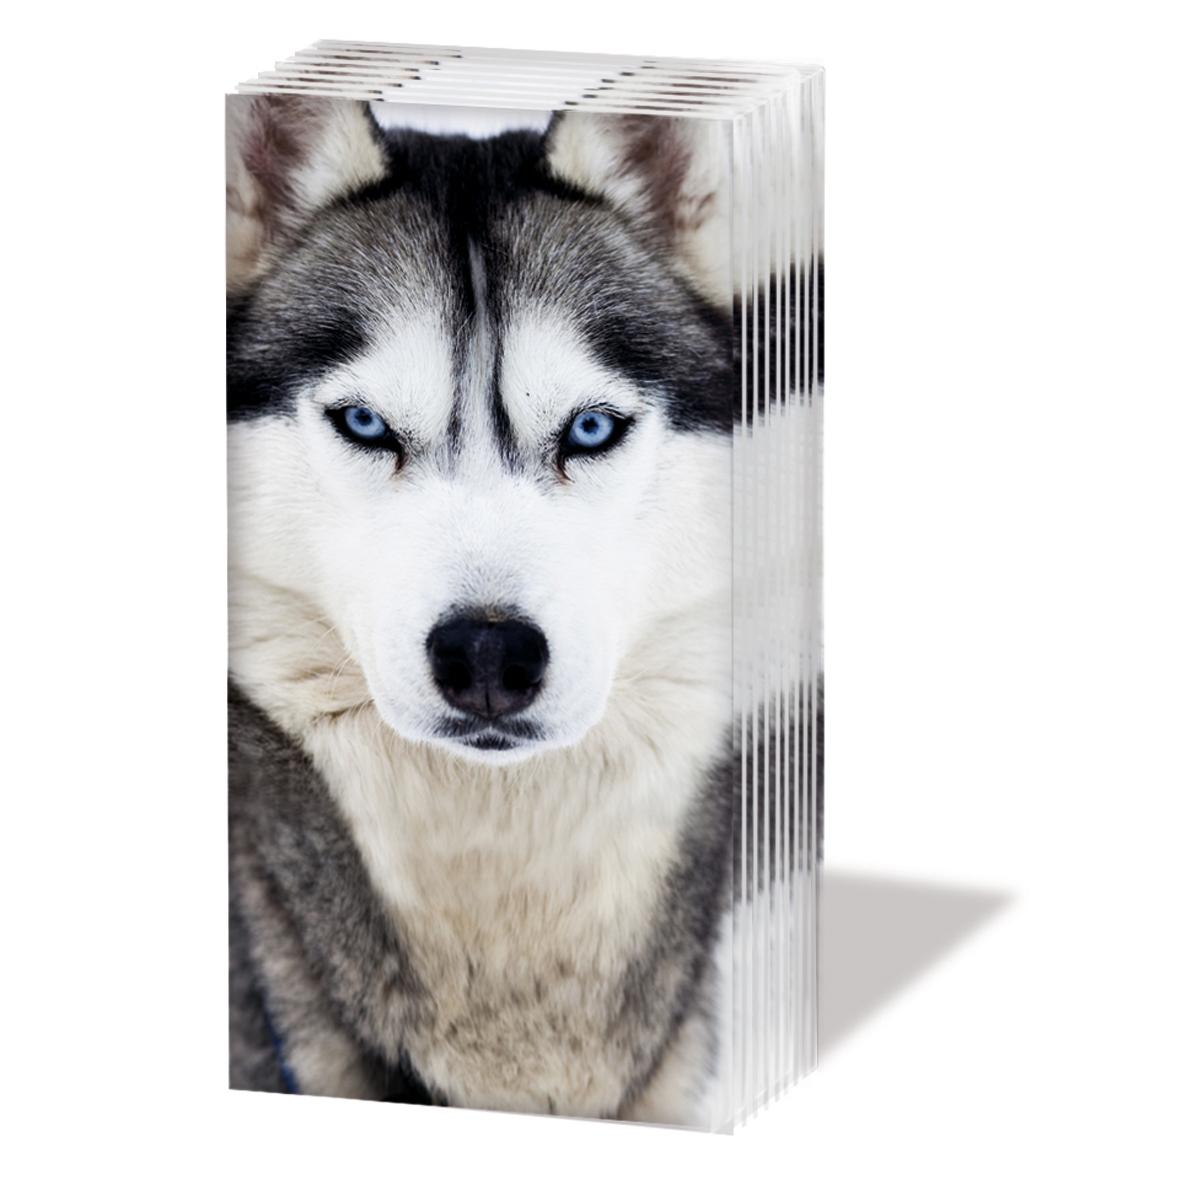 Taschentücher Husky,  Tiere,  Everyday,  bedruckte papiertaschentücher,  Hunde,  Husky